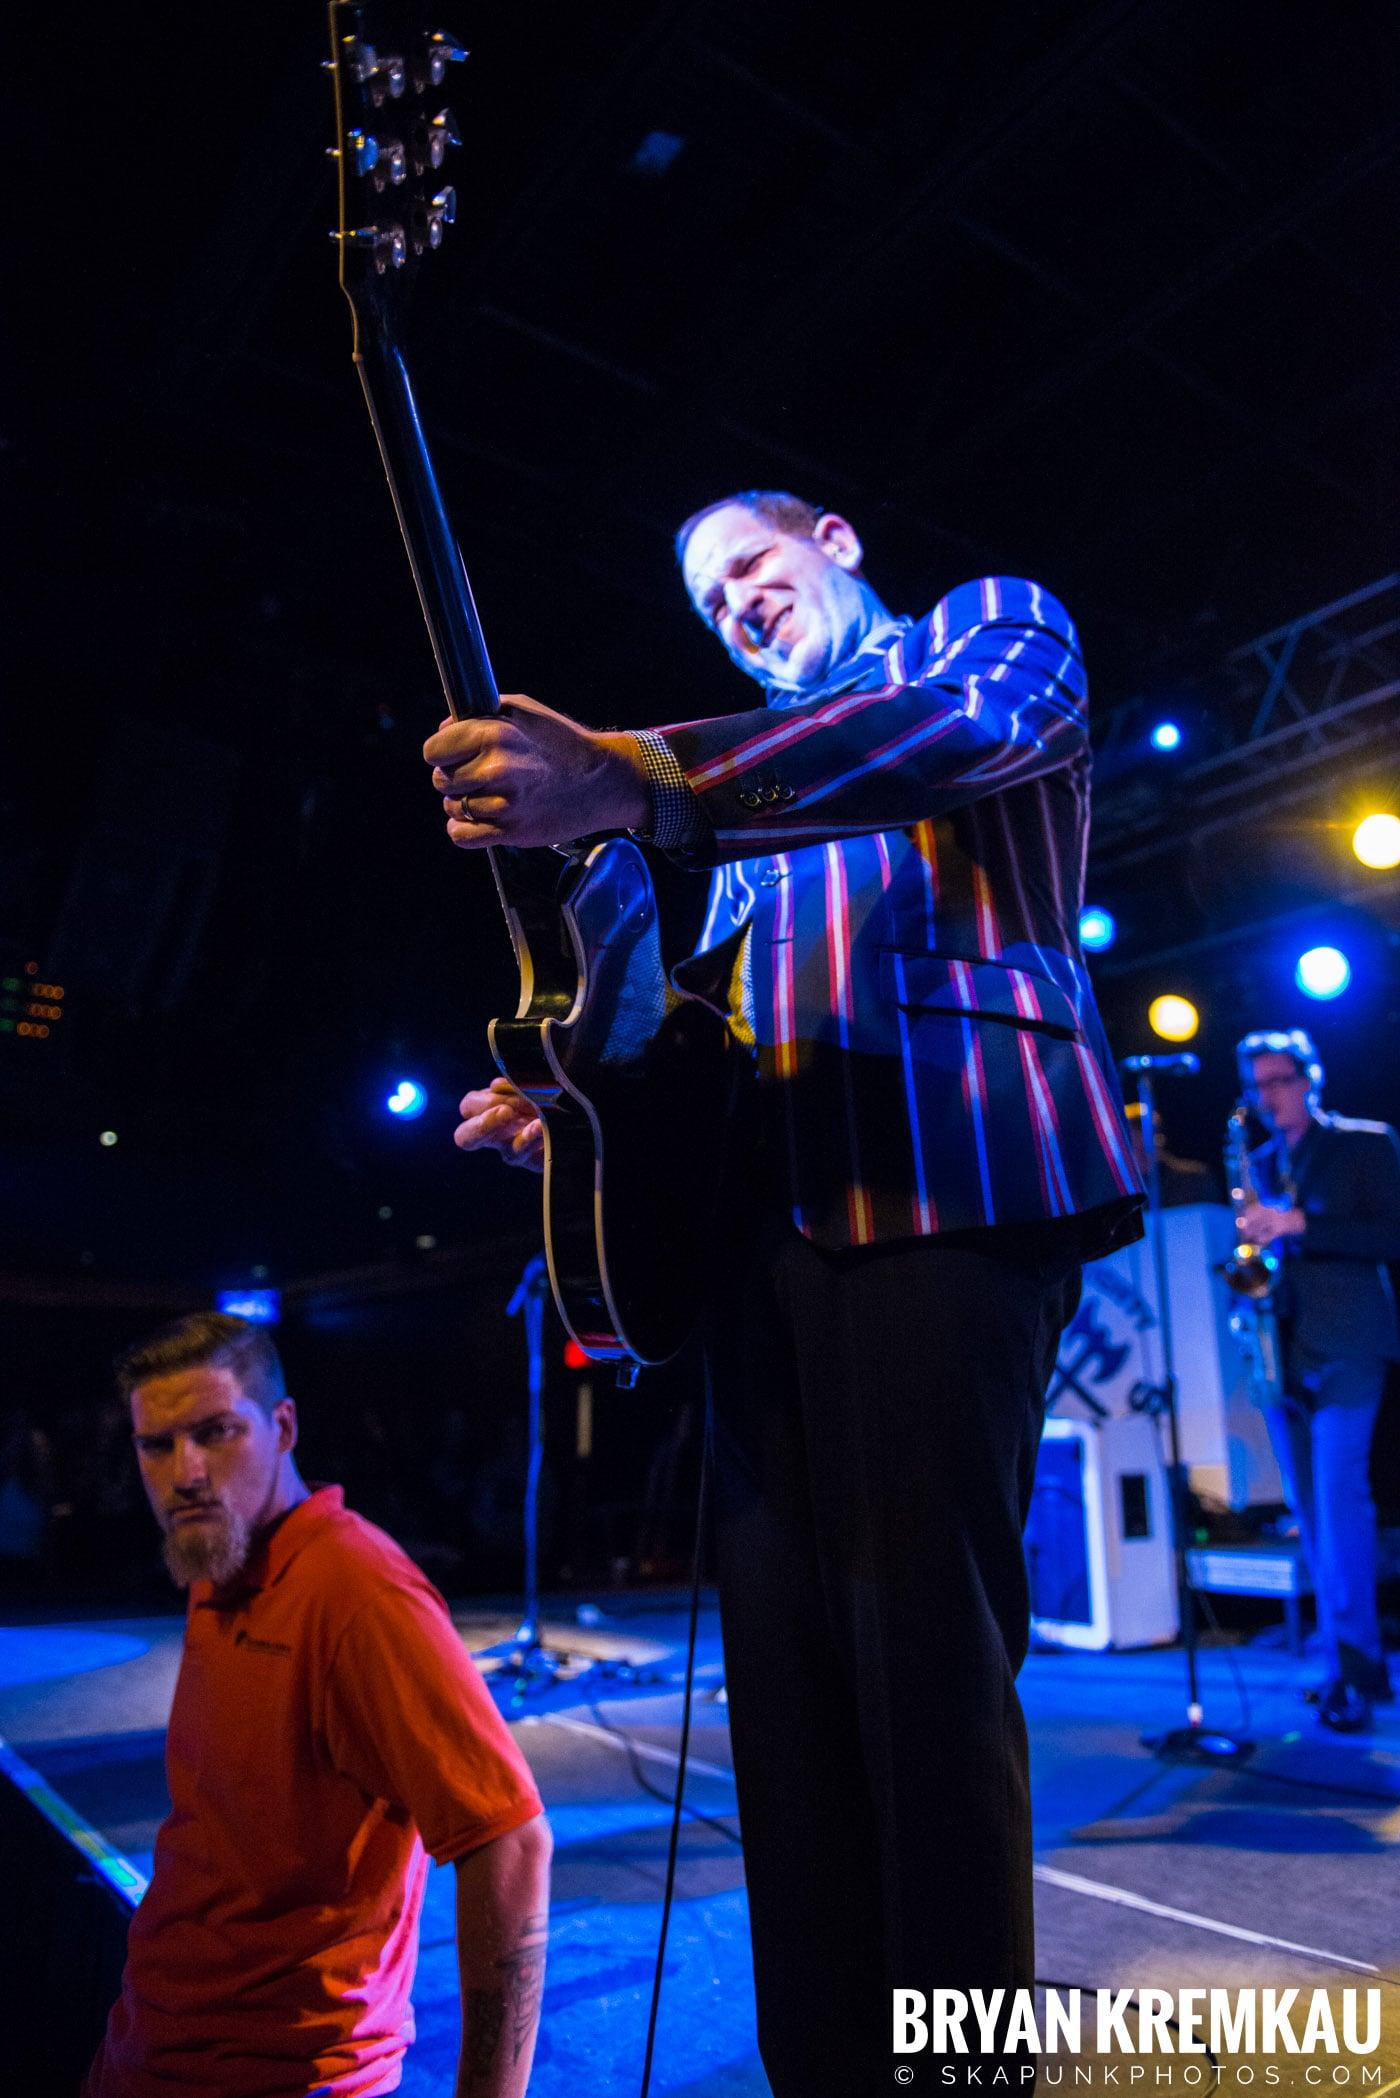 Mighty Mighty Bosstones @ Starland Ballroom, Sayreville, NJ - 7.29.17 (15)